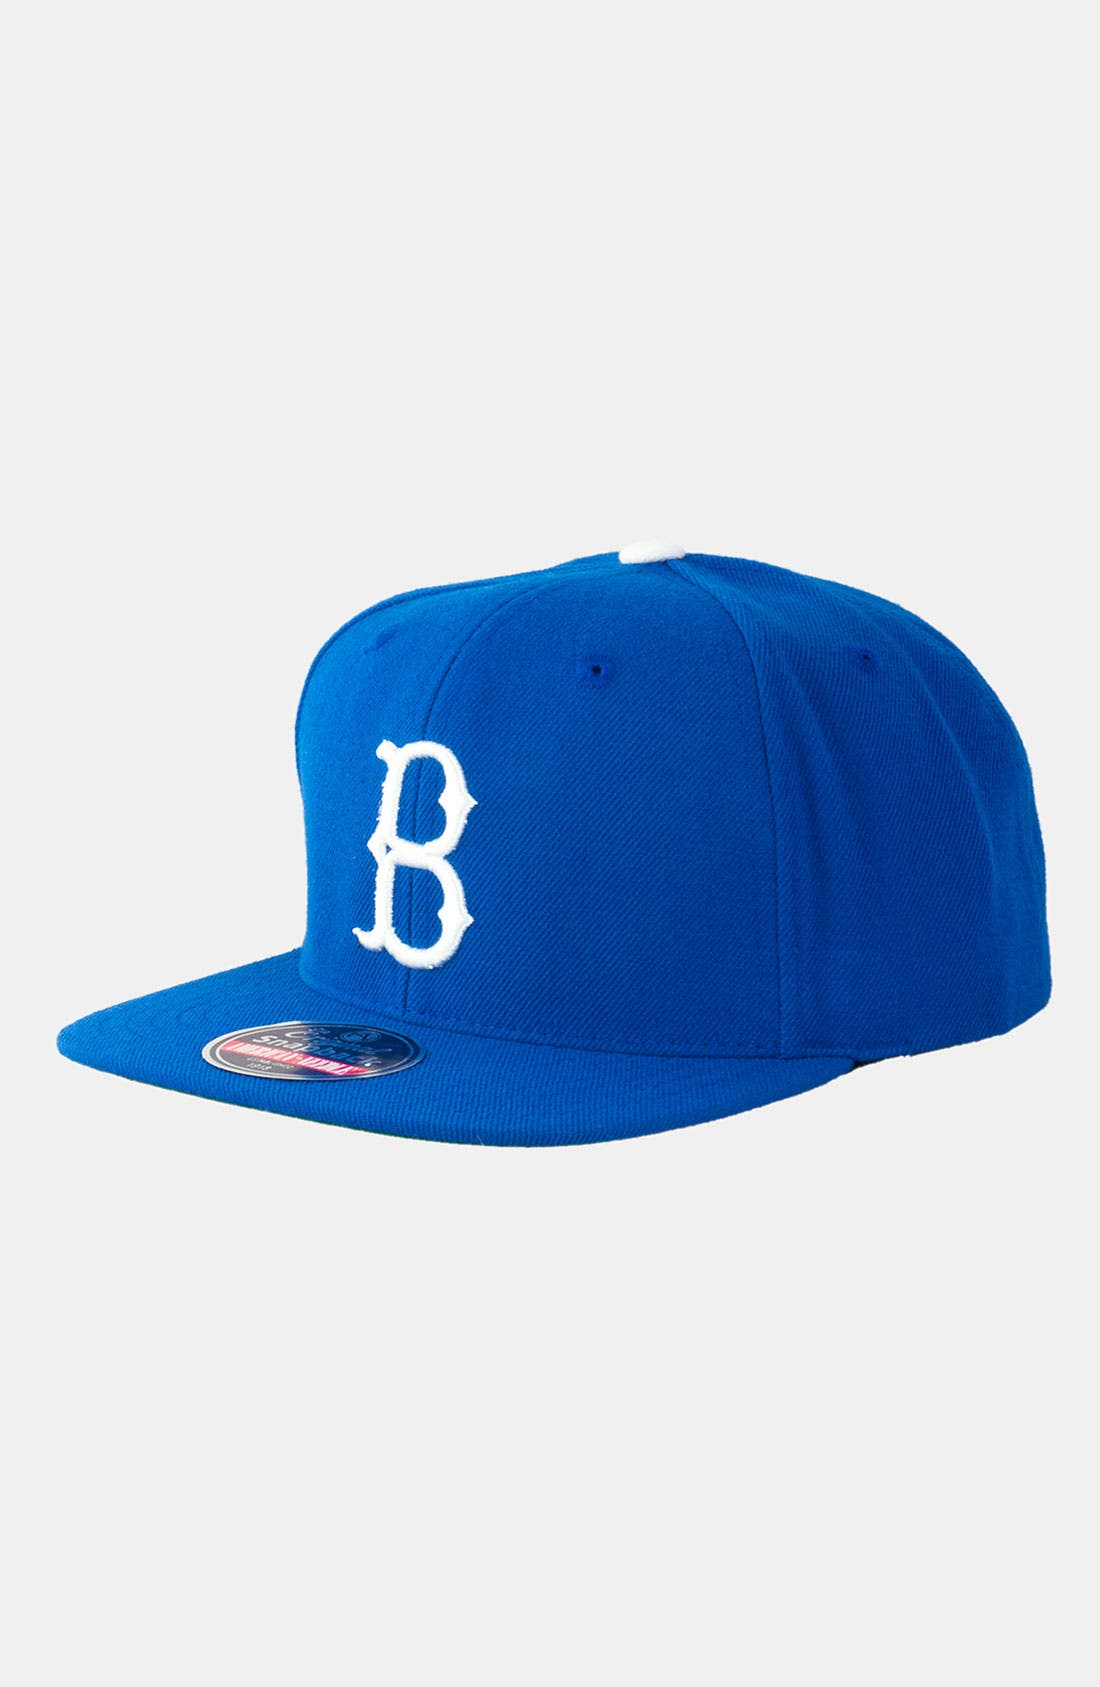 Main Image - American Needle 'Brooklyn Dodgers - Cooperstown' Snapback Baseball Cap